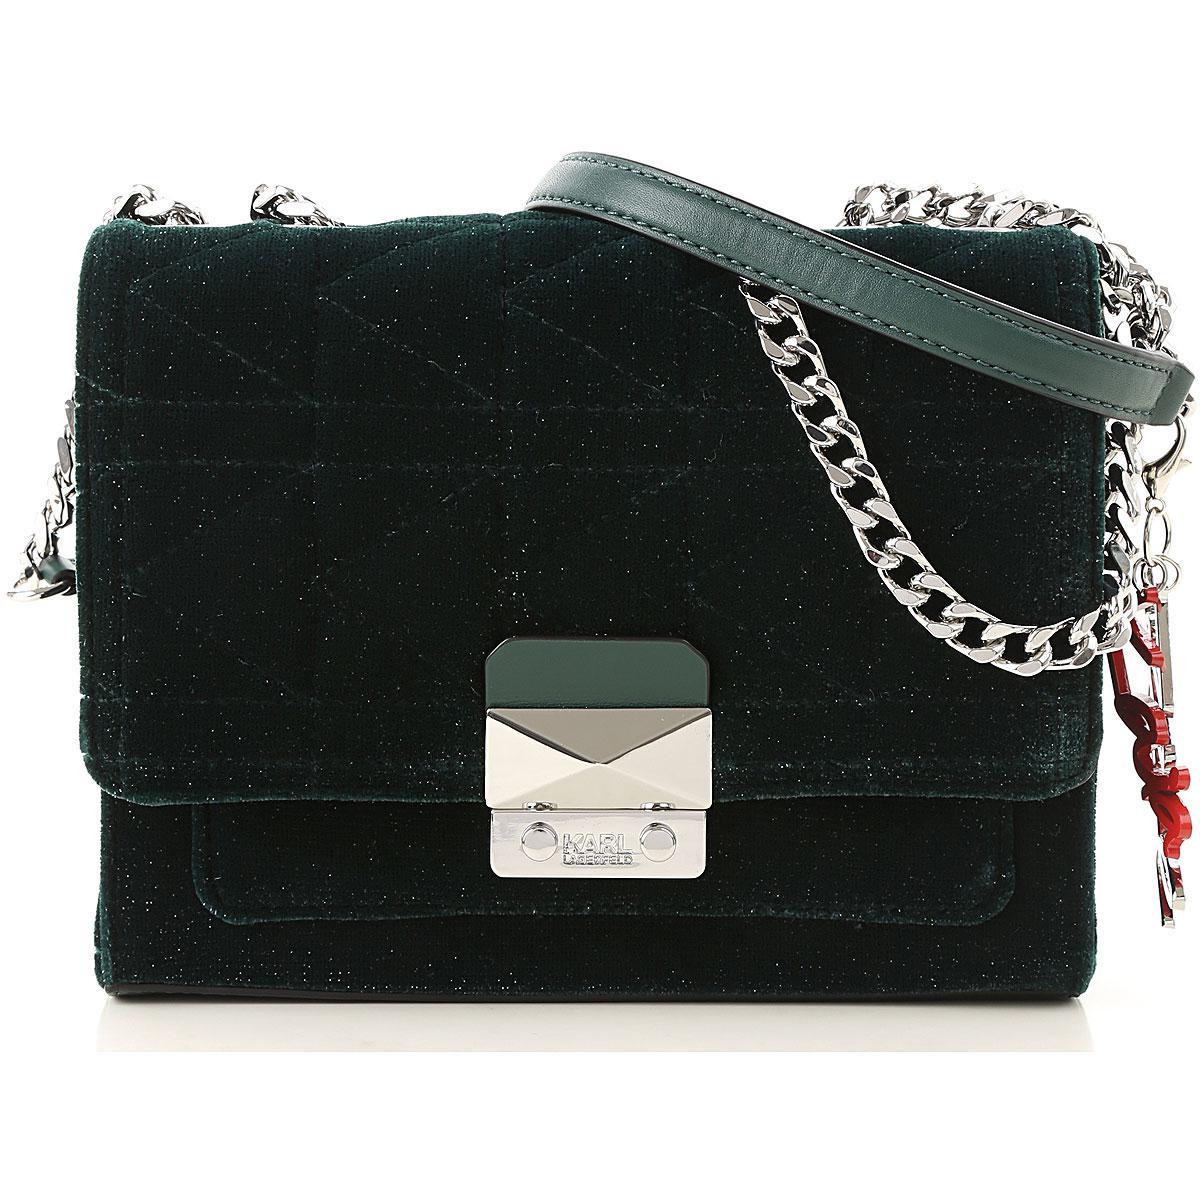 da21534016 Lyst - Karl Lagerfeld Shoulder Bag For Women in Black